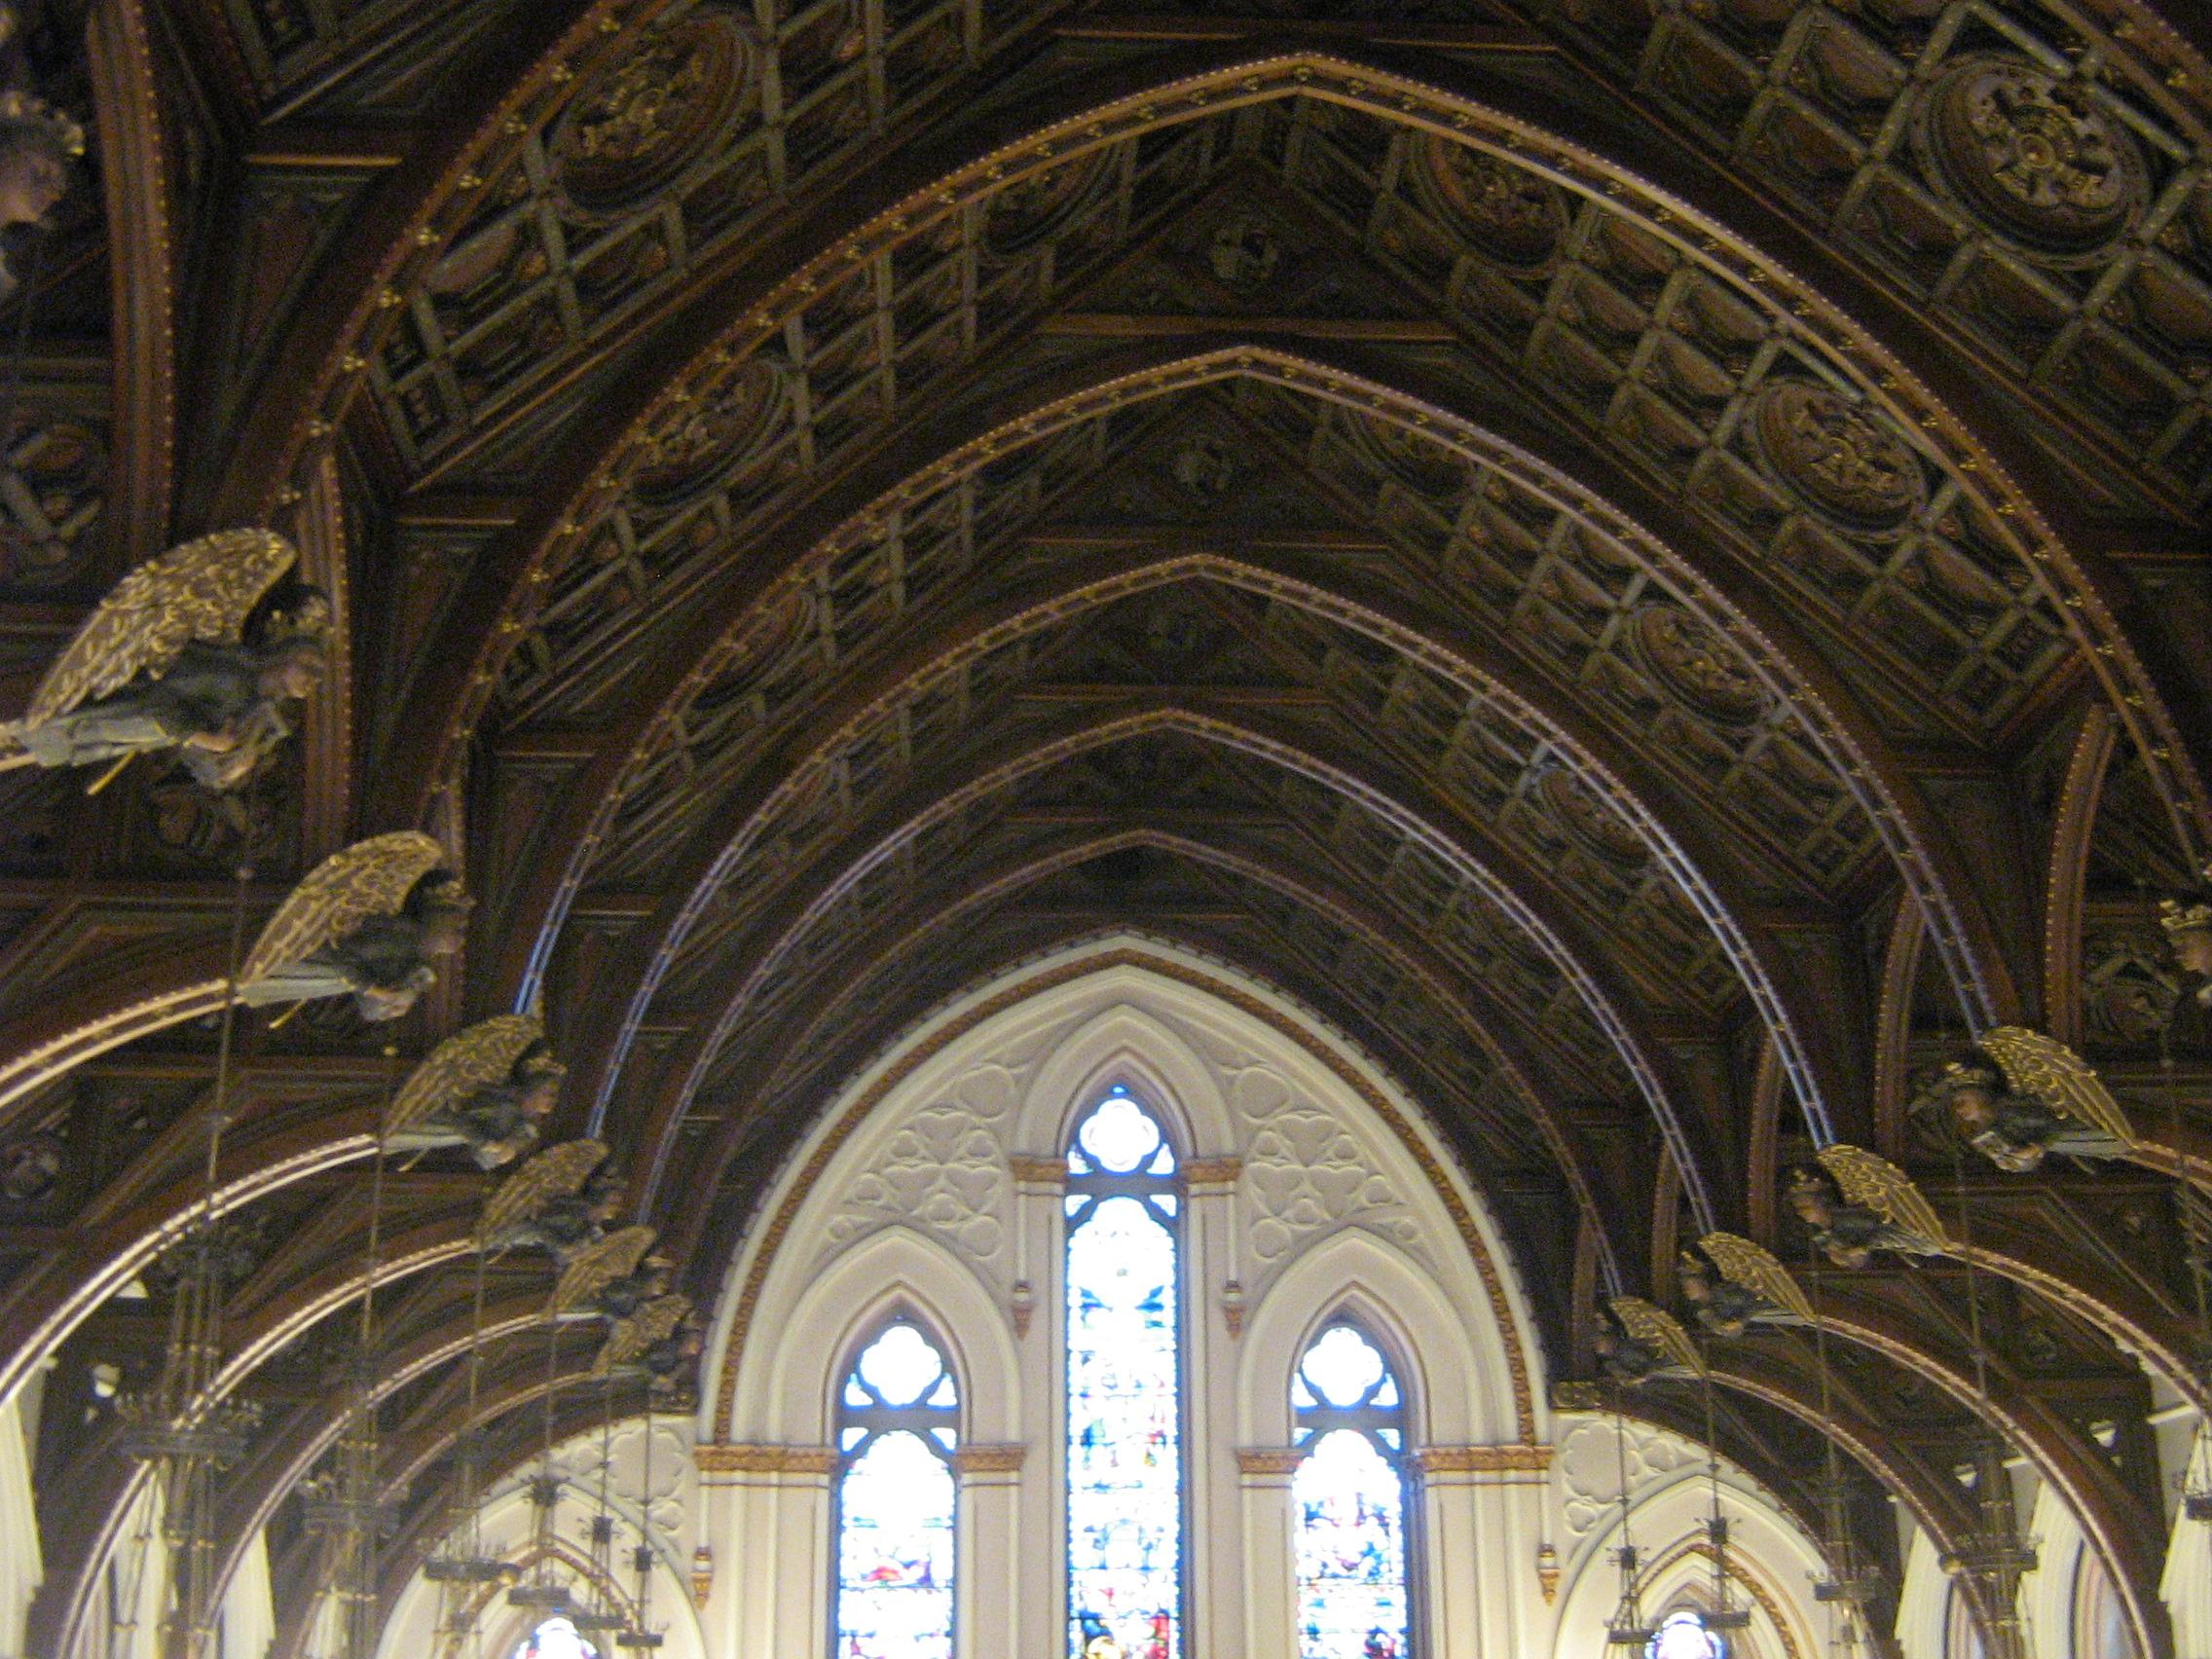 Interior of St. Mary's Church (1887 1893)